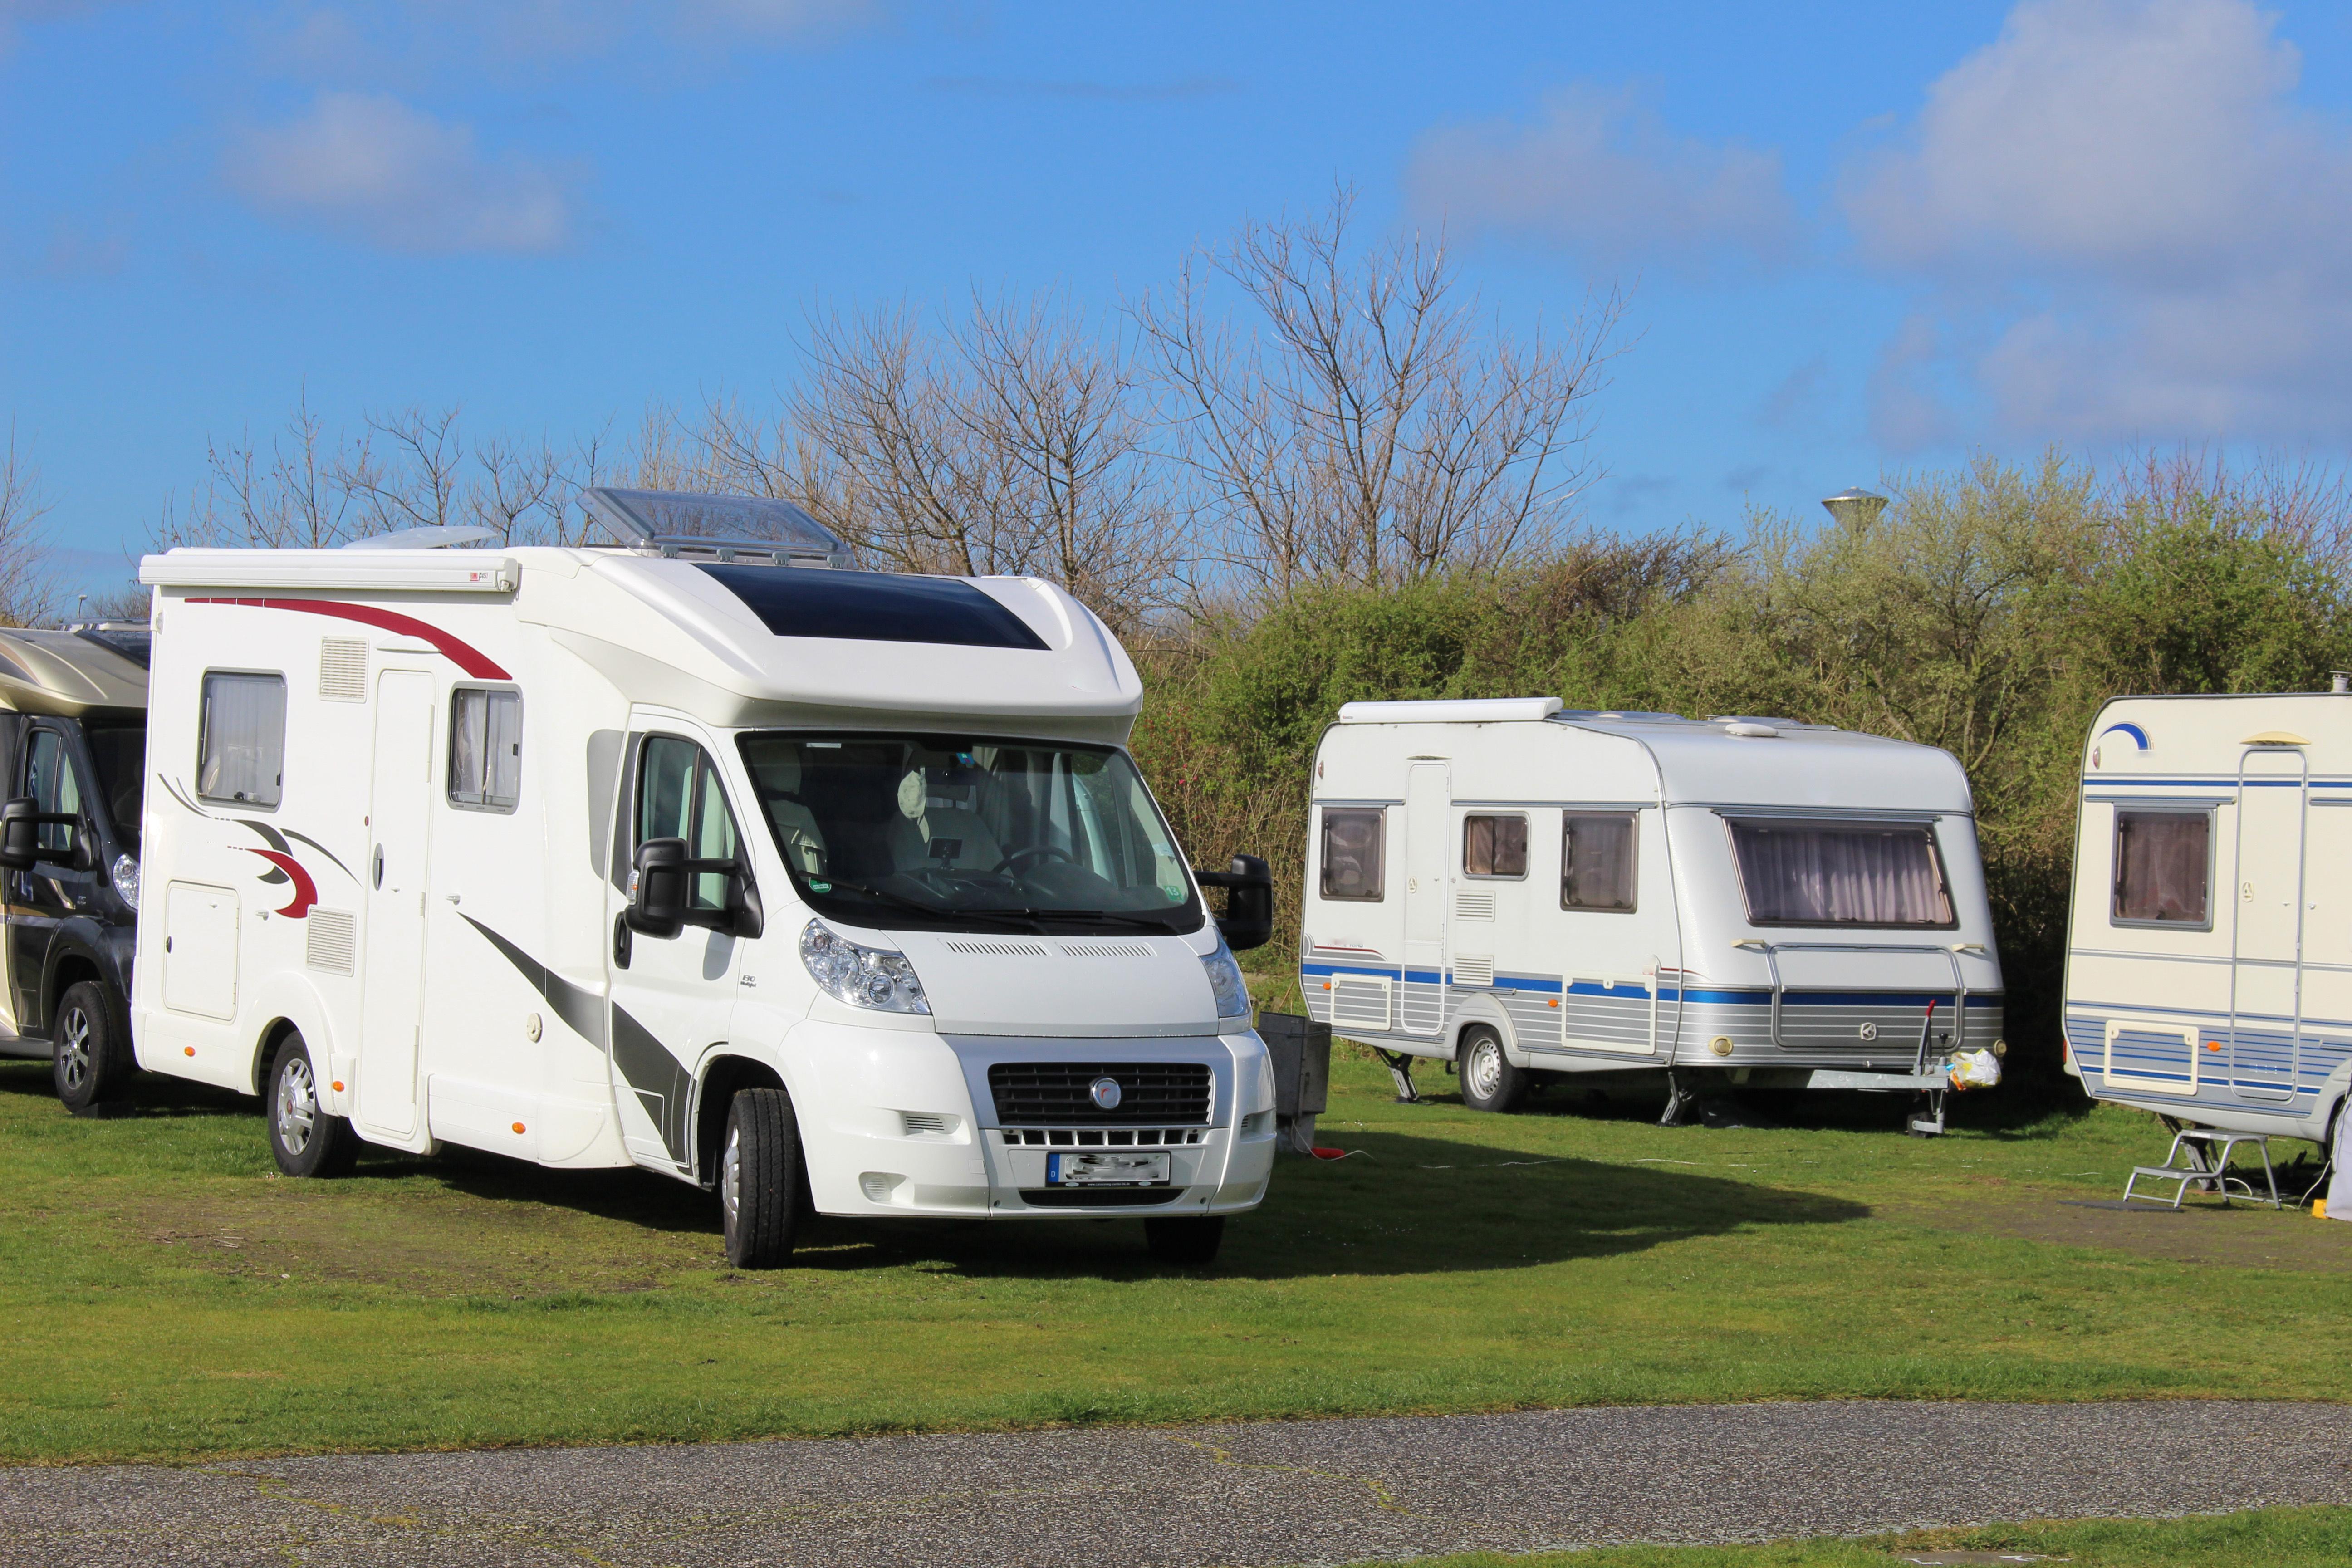 Wohnmobil Campingplatz Niederlande - Salind GPS